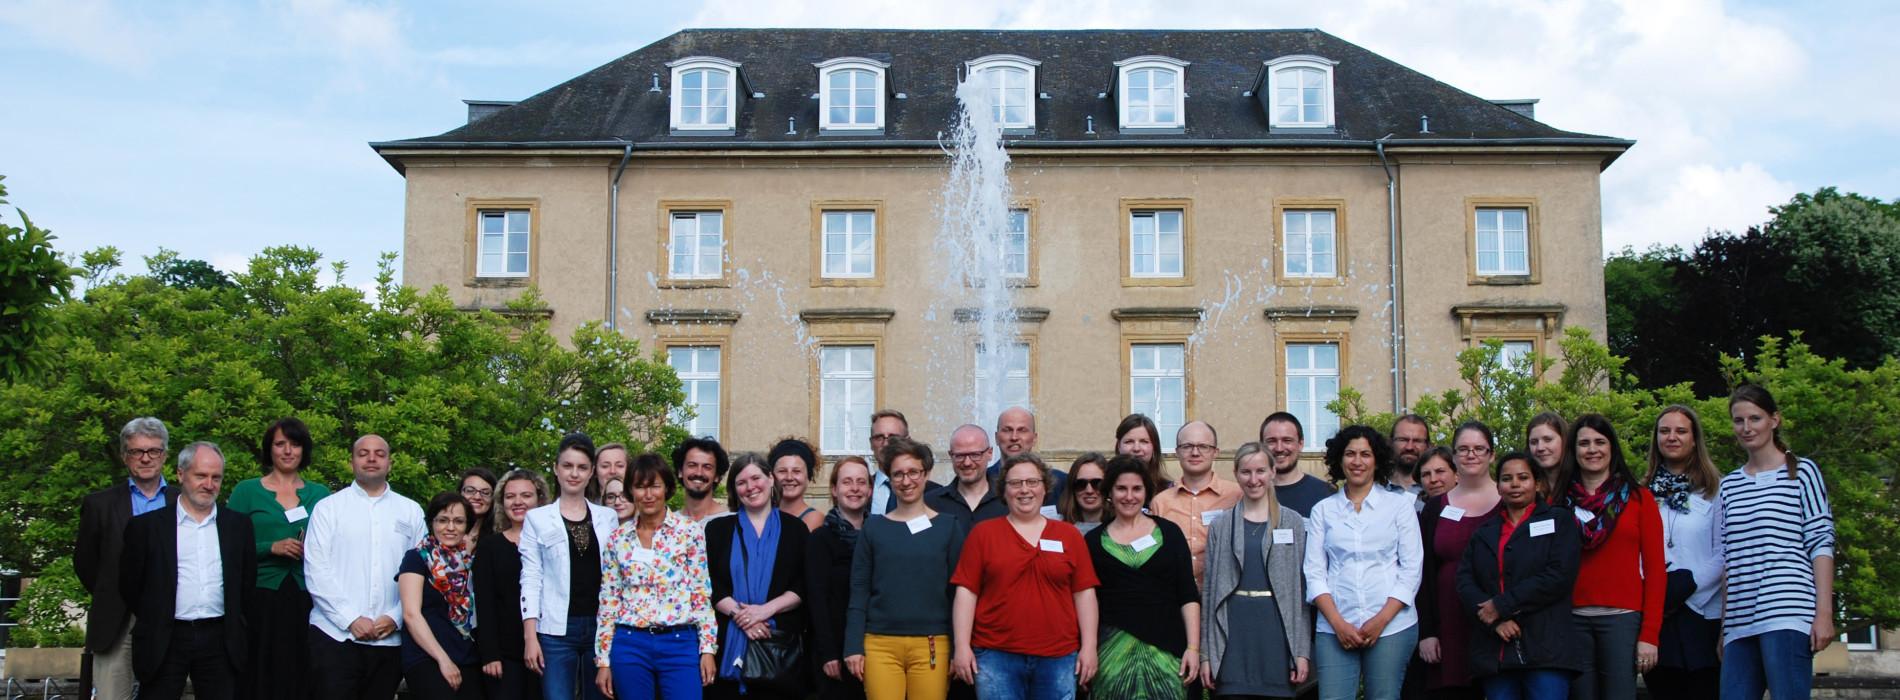 International Histories of Education Summer School held in Luxembourg 18-20 June 2015